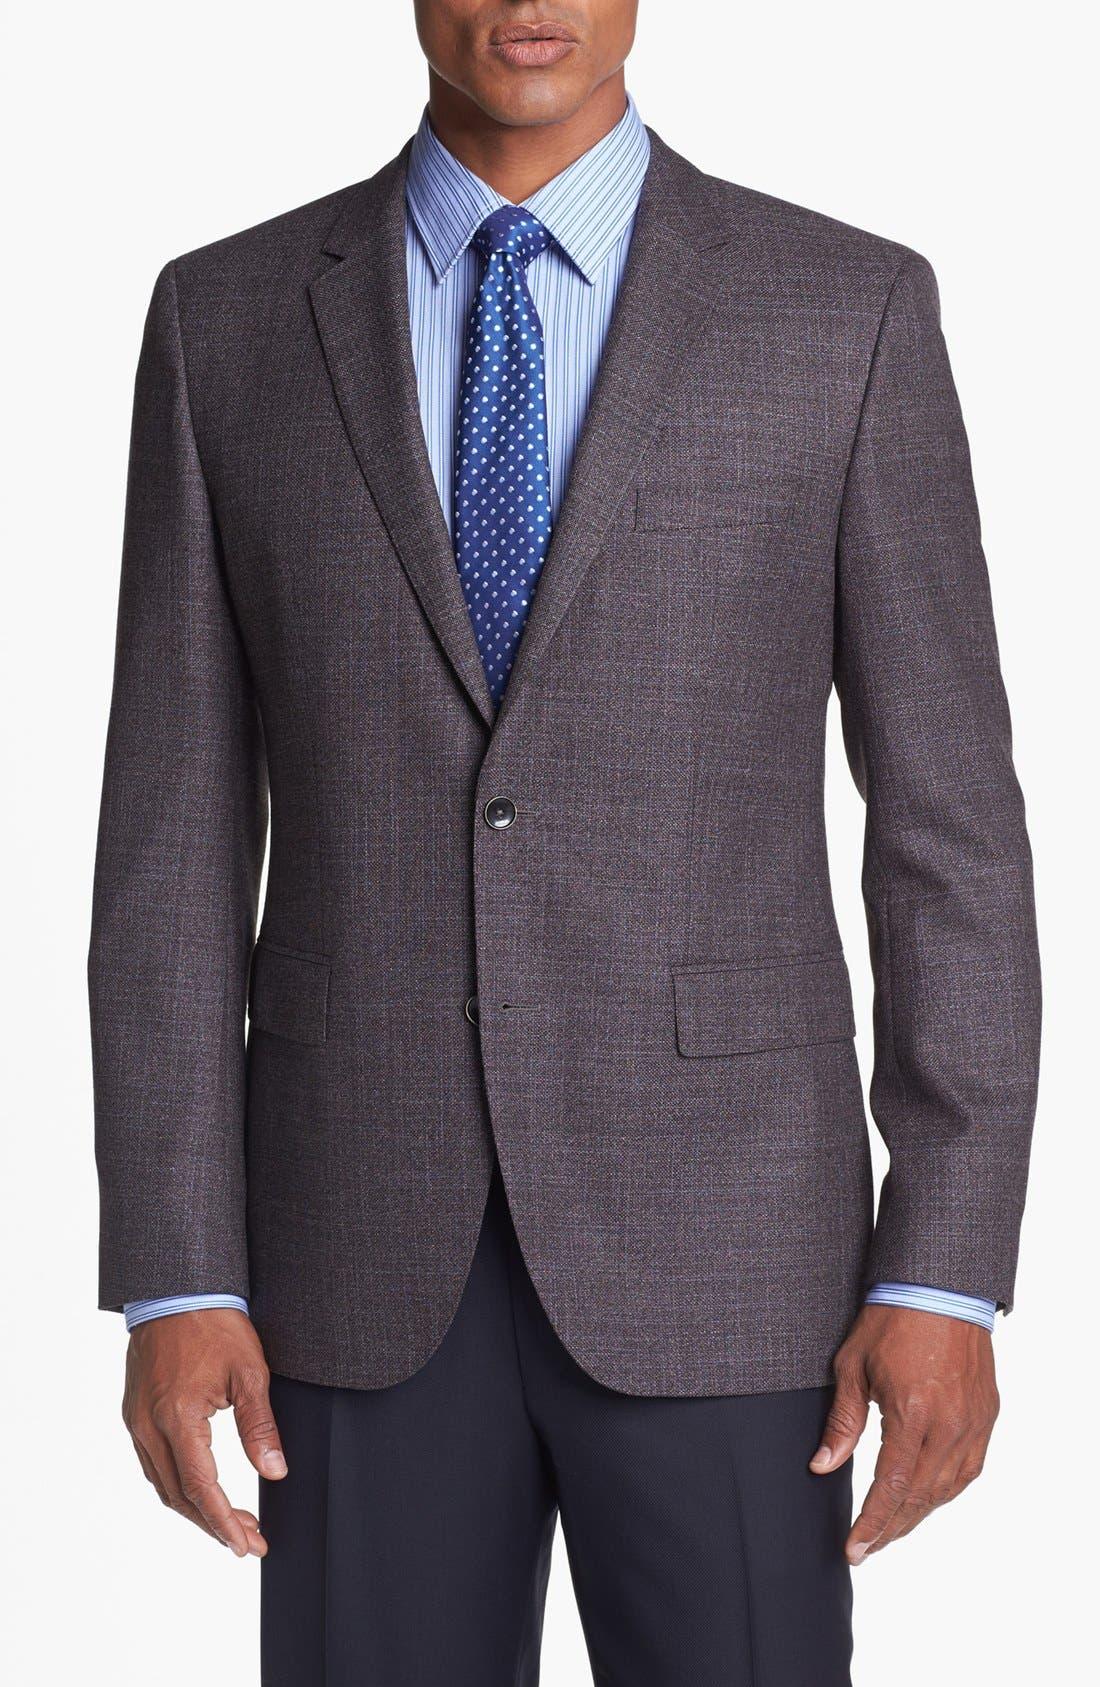 Alternate Image 1 Selected - BOSS HUGO BOSS 'The Keys' Trim Fit Wool Sportcoat